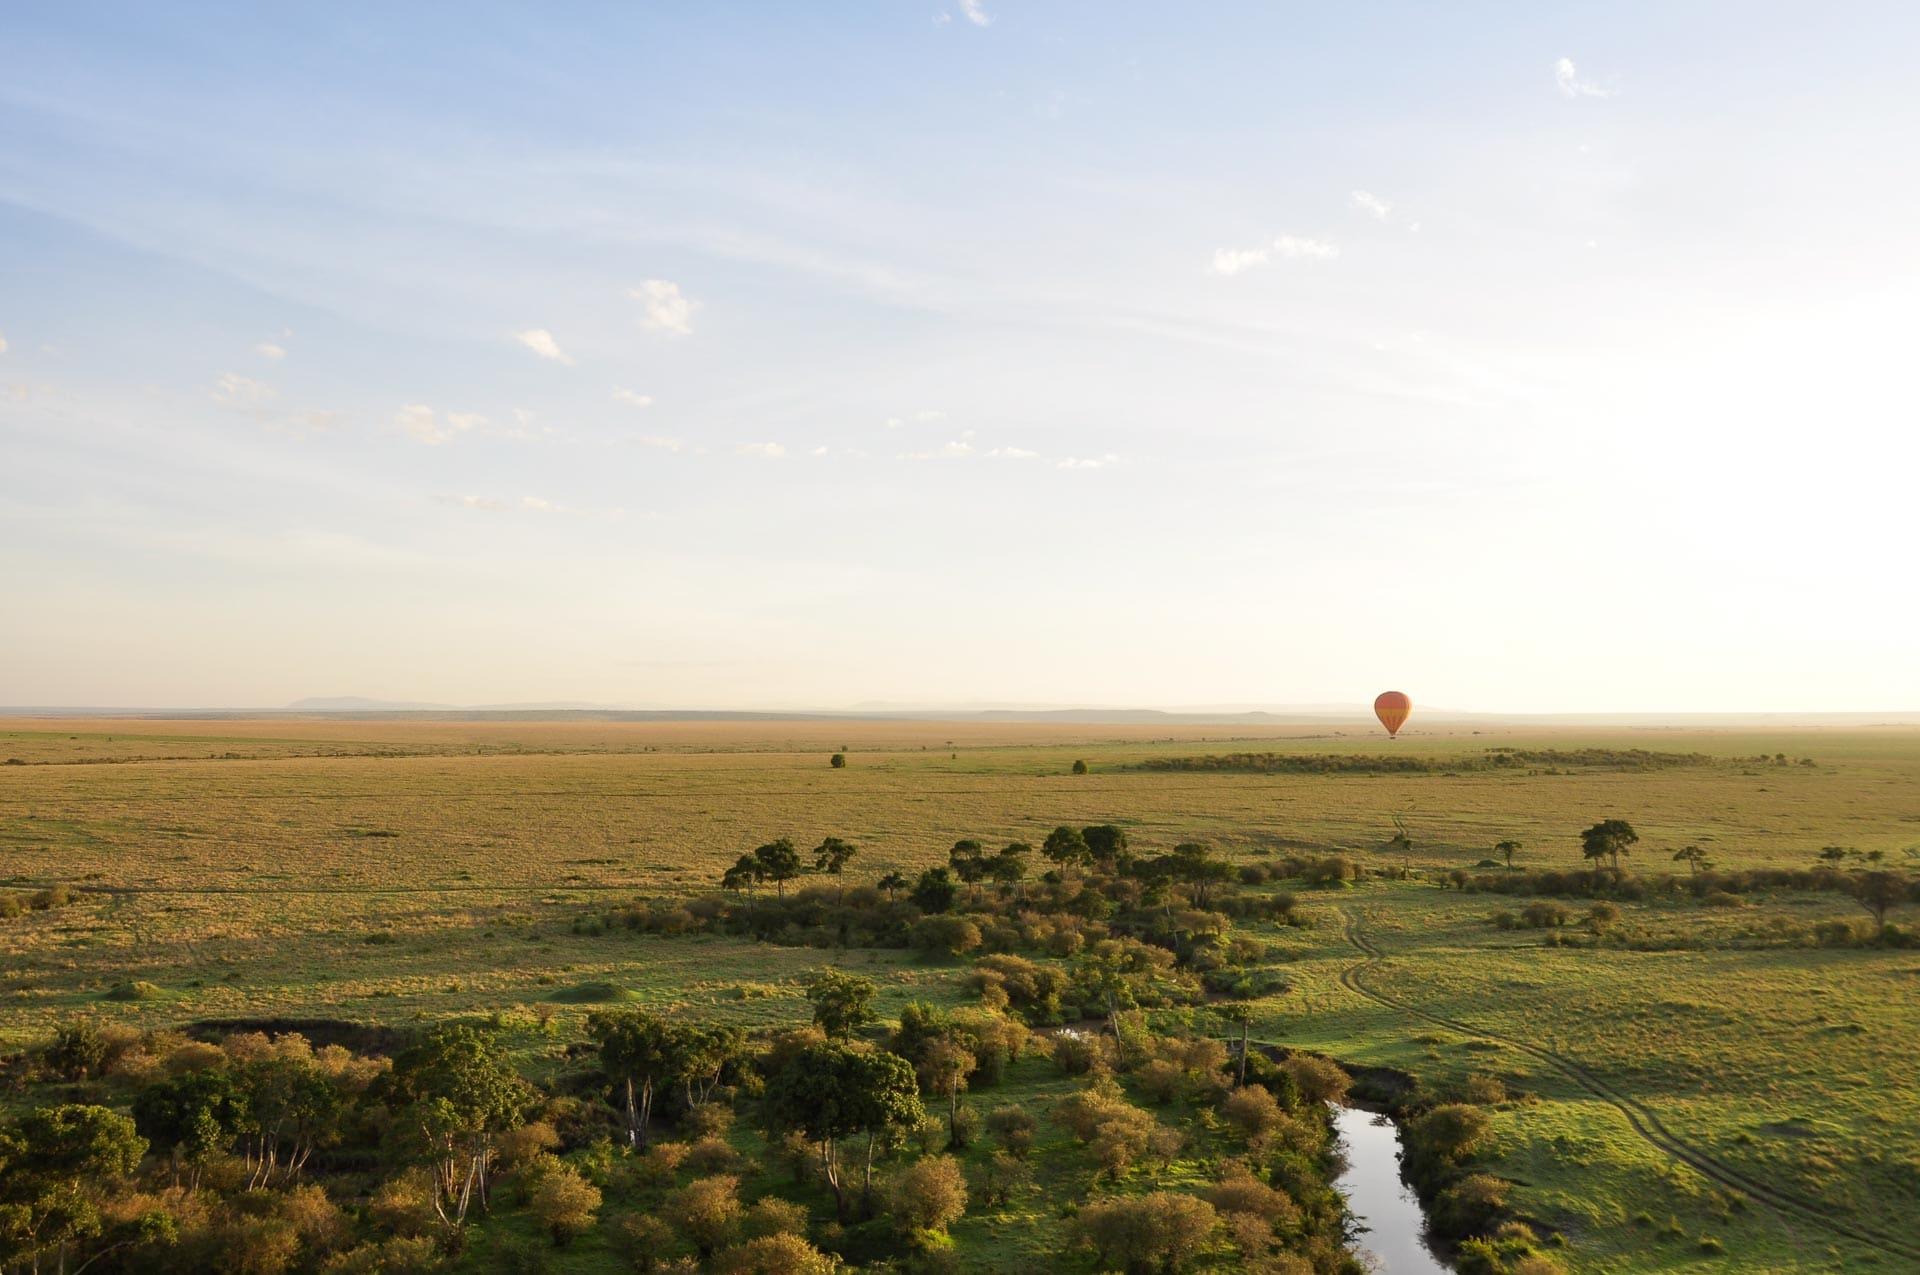 Masai-Mara-Ballonfahrt-Kenia-Globetrotter-Select-11